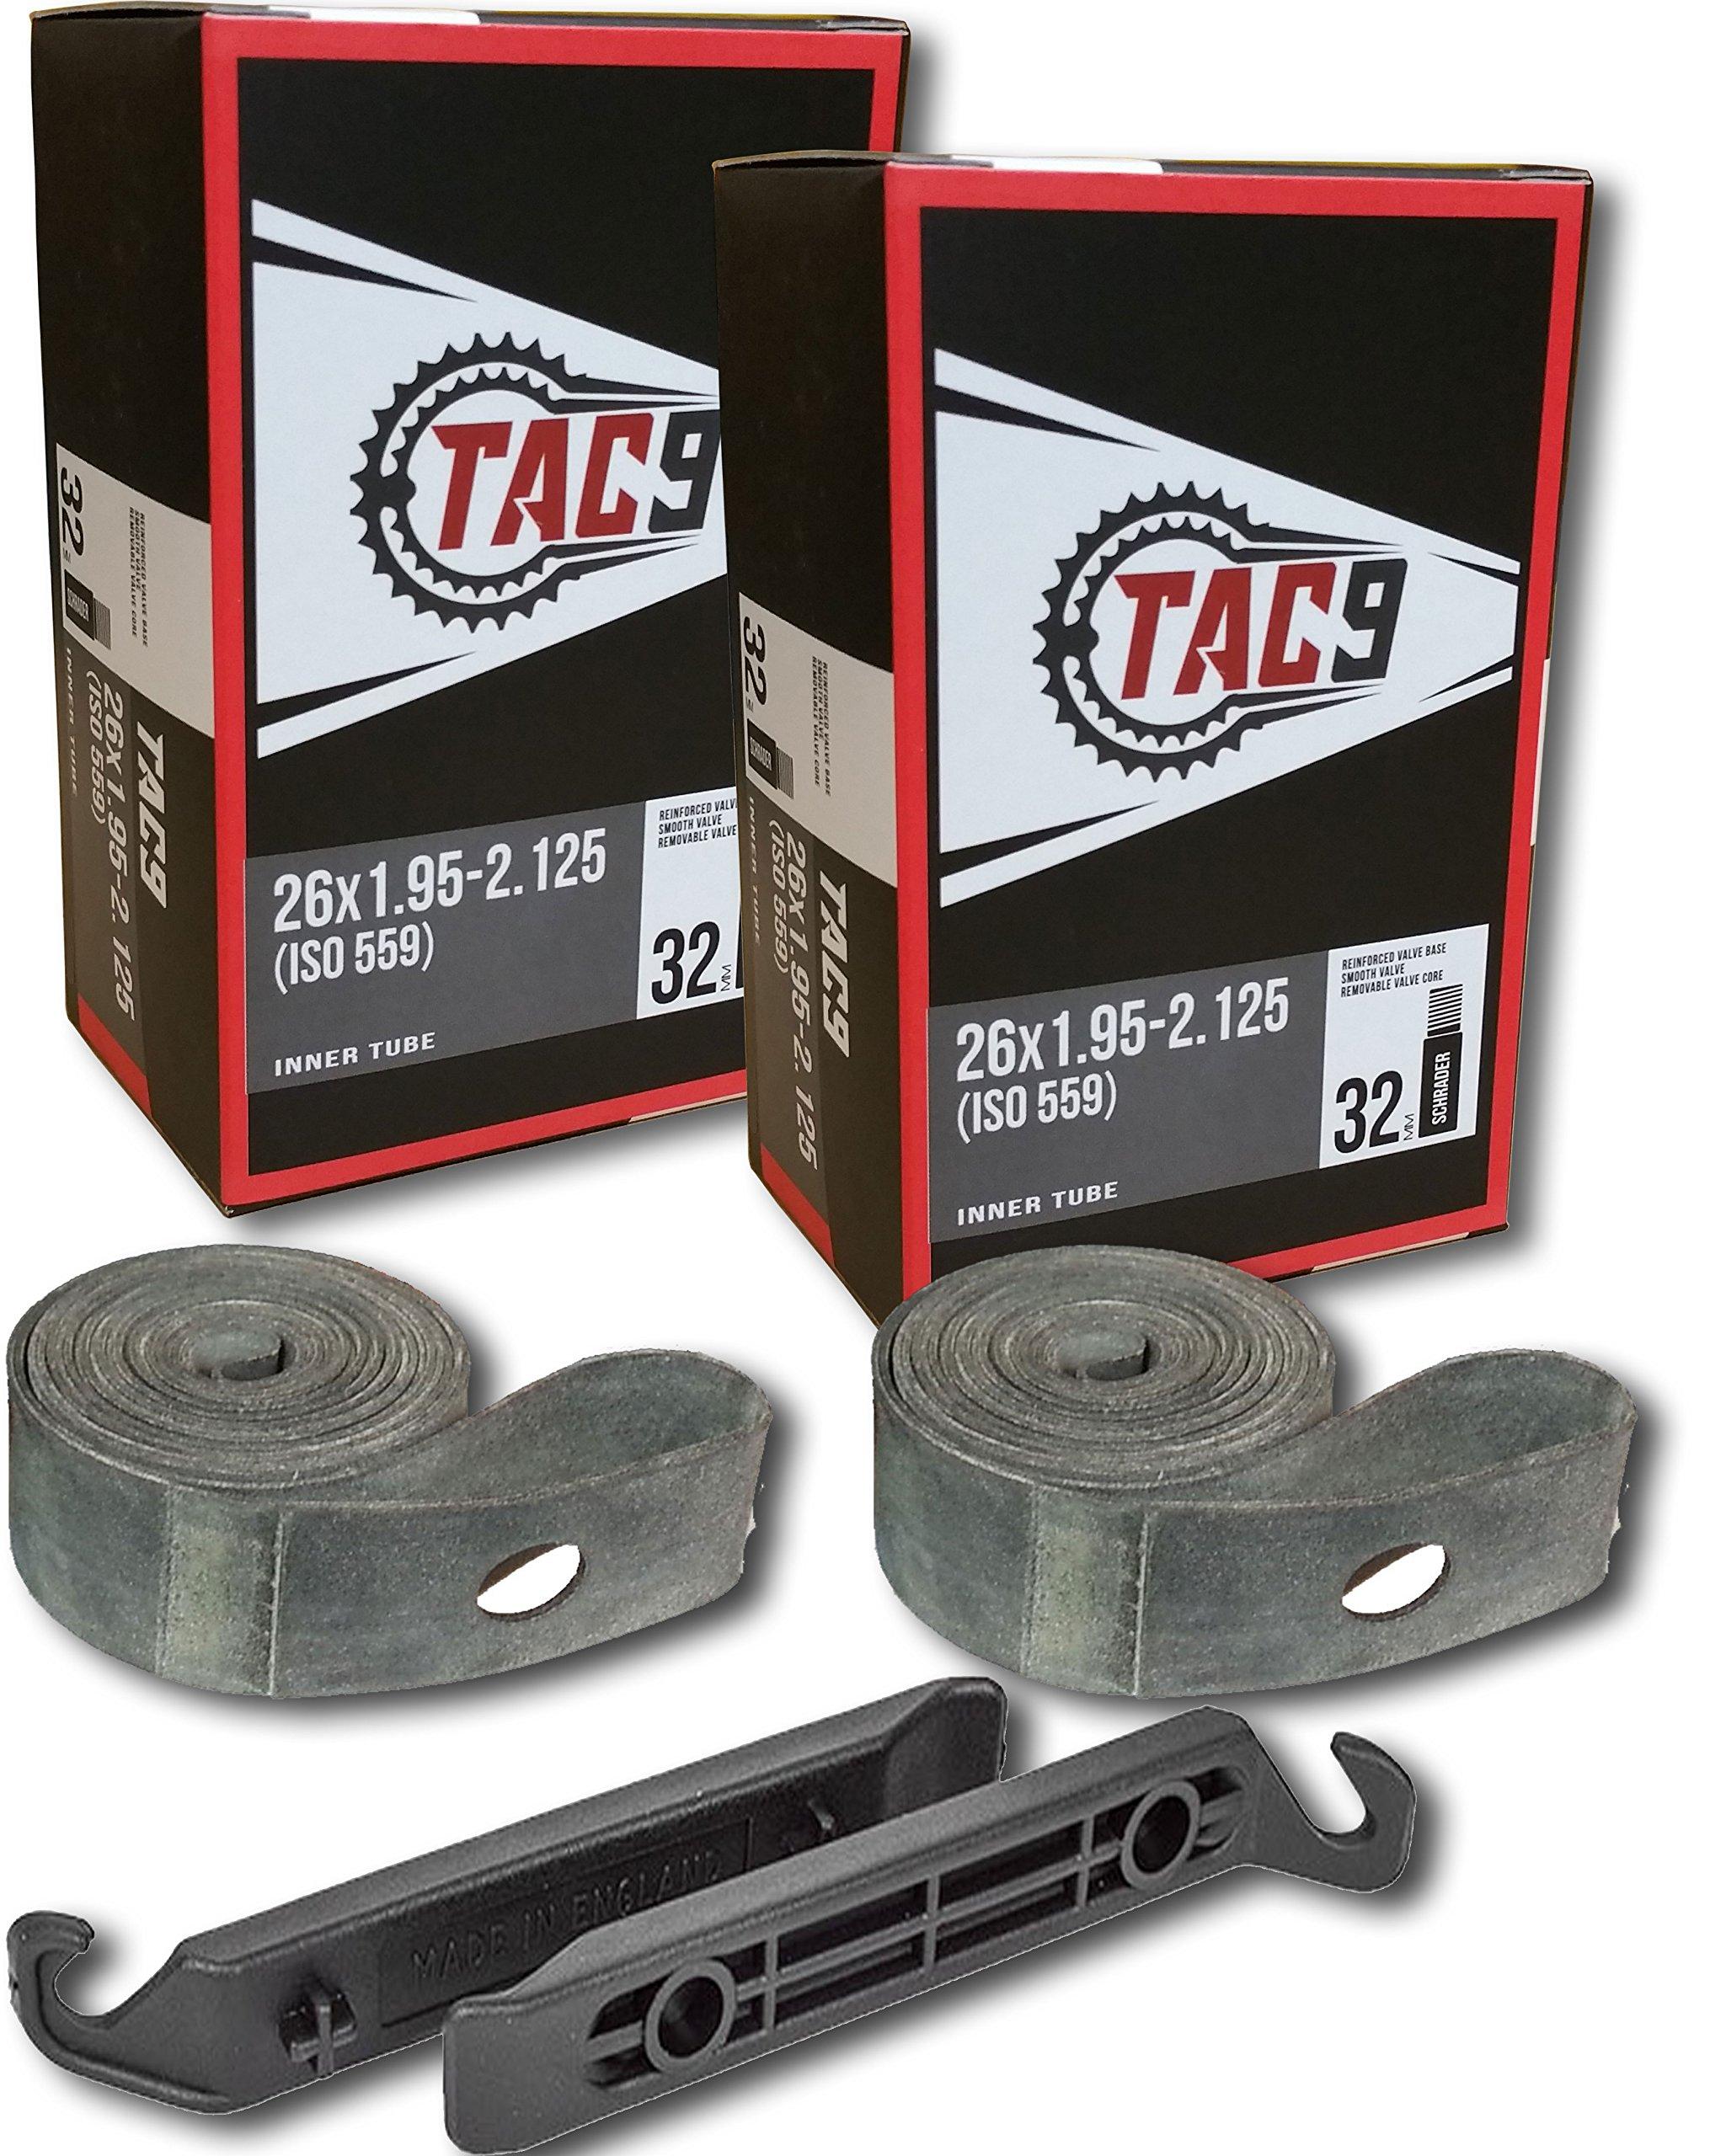 TAC 9 3 Pack Bike Tubes, 26 x 1.95-2.125'' Regular Valve 32mm - Tubes, Rim Strips and Tire Levers Bundle